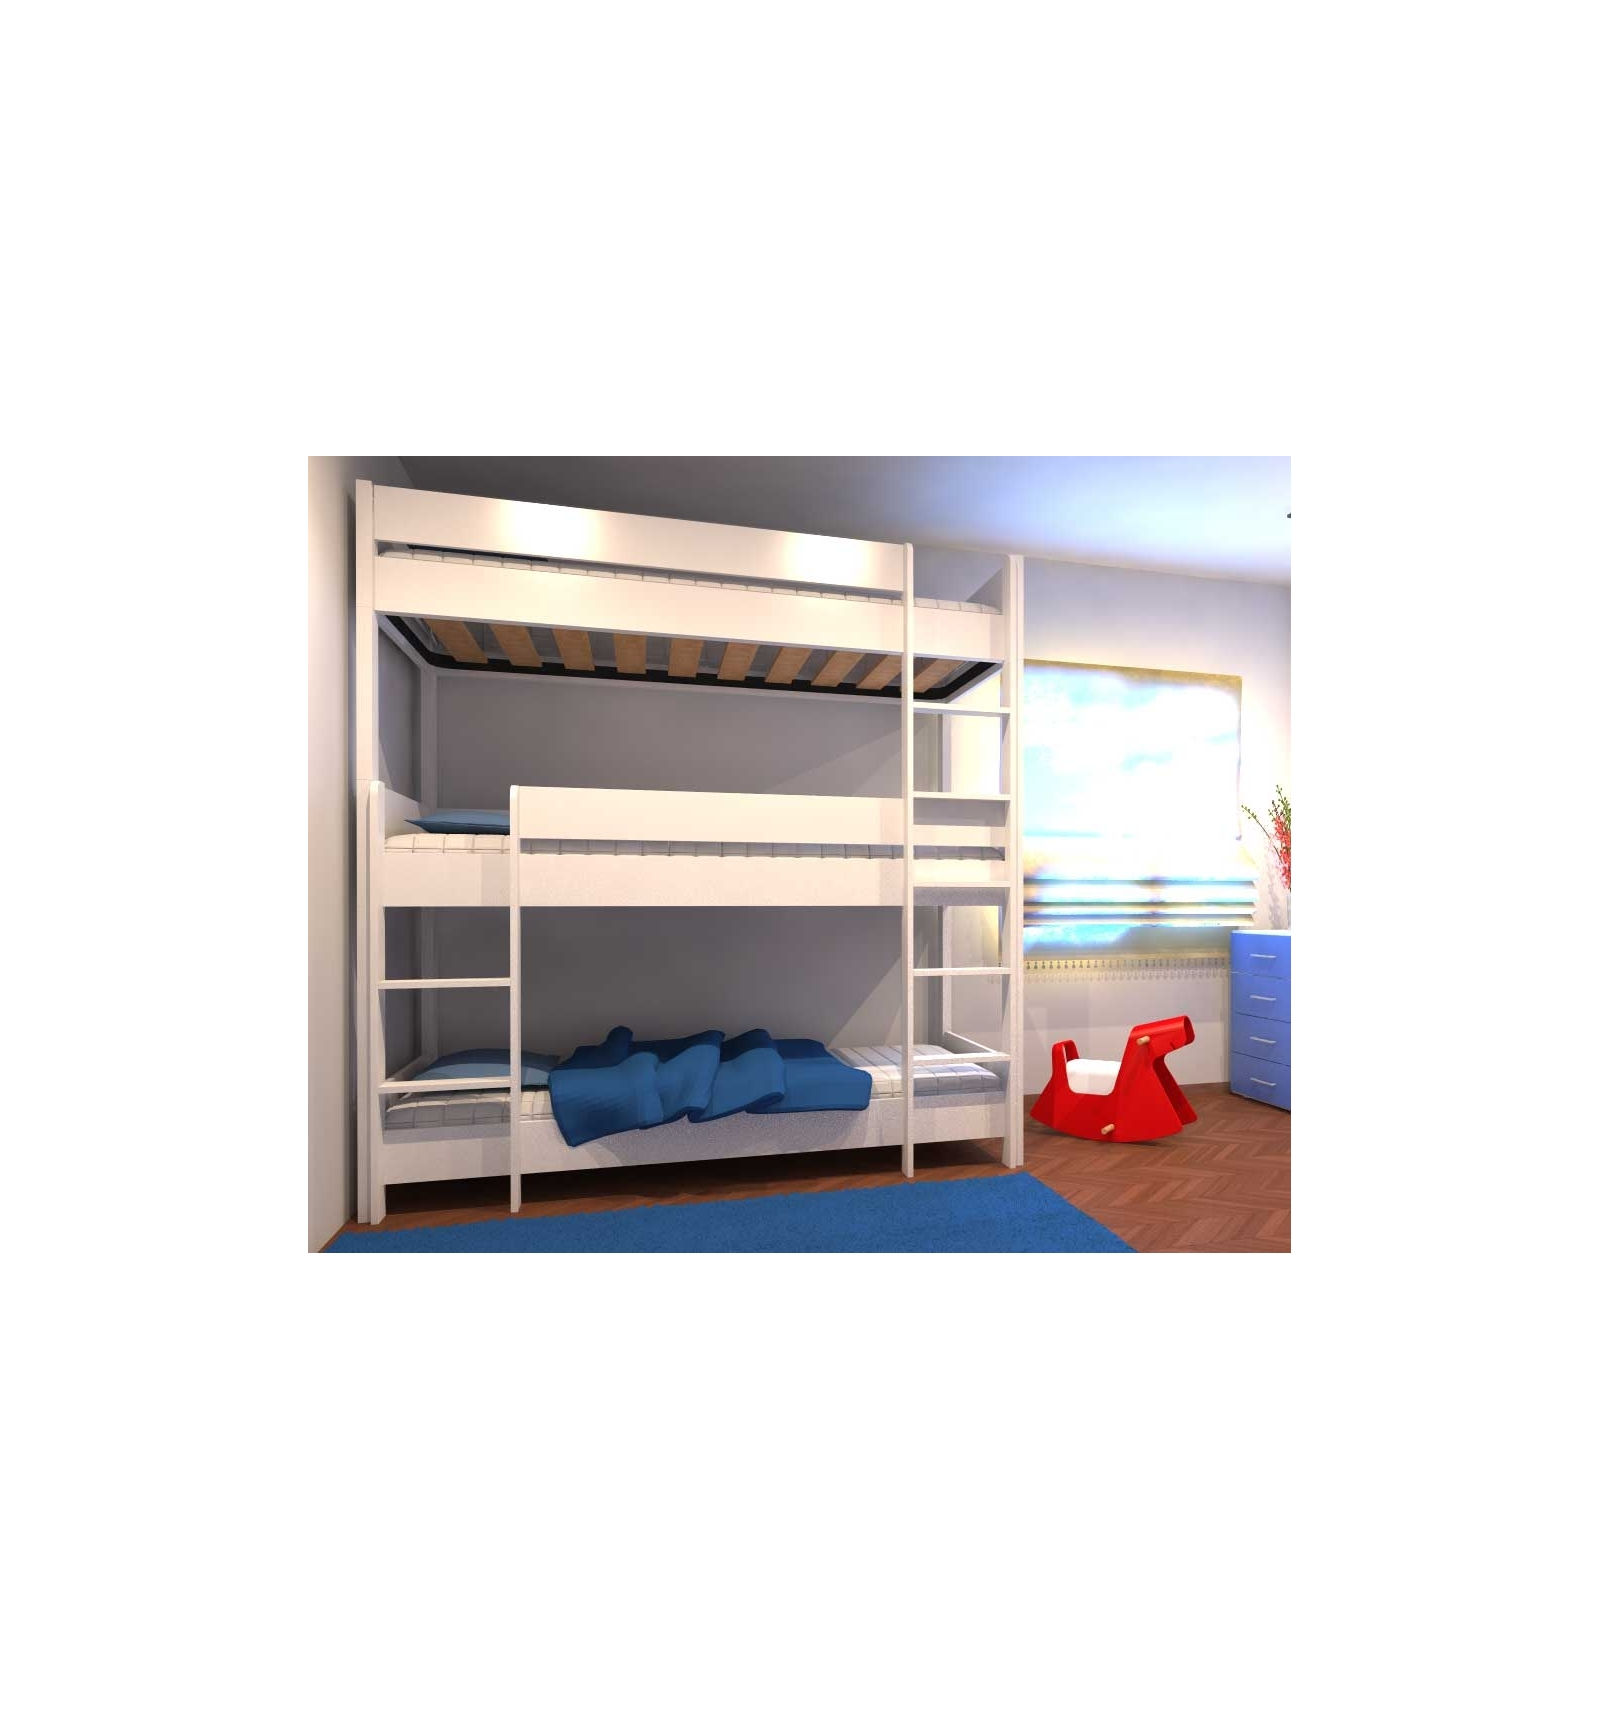 lit superpos triple. Black Bedroom Furniture Sets. Home Design Ideas